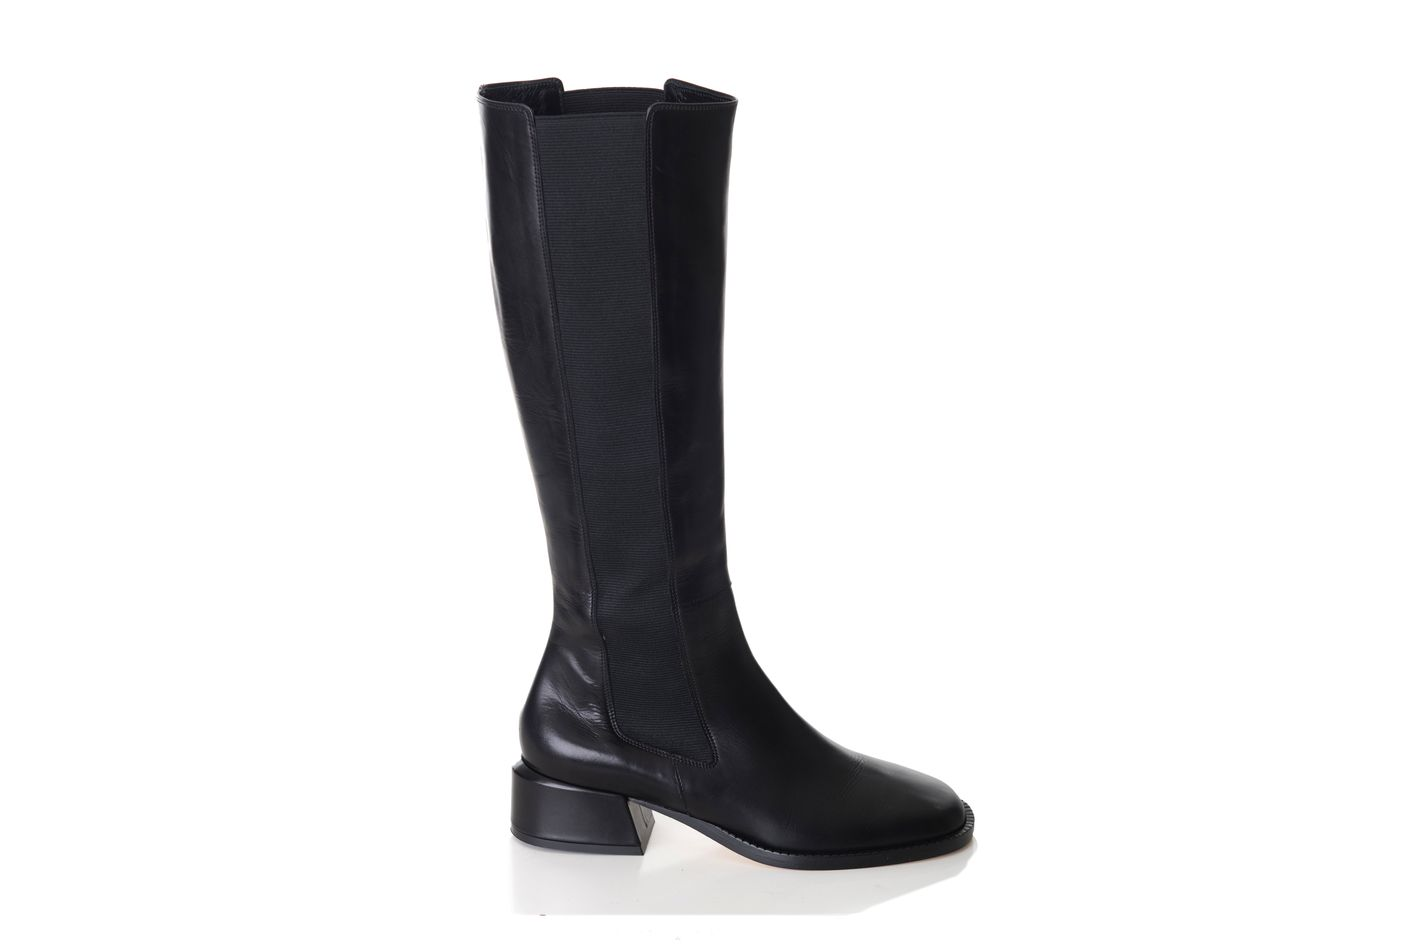 Tibi Amelia Boots